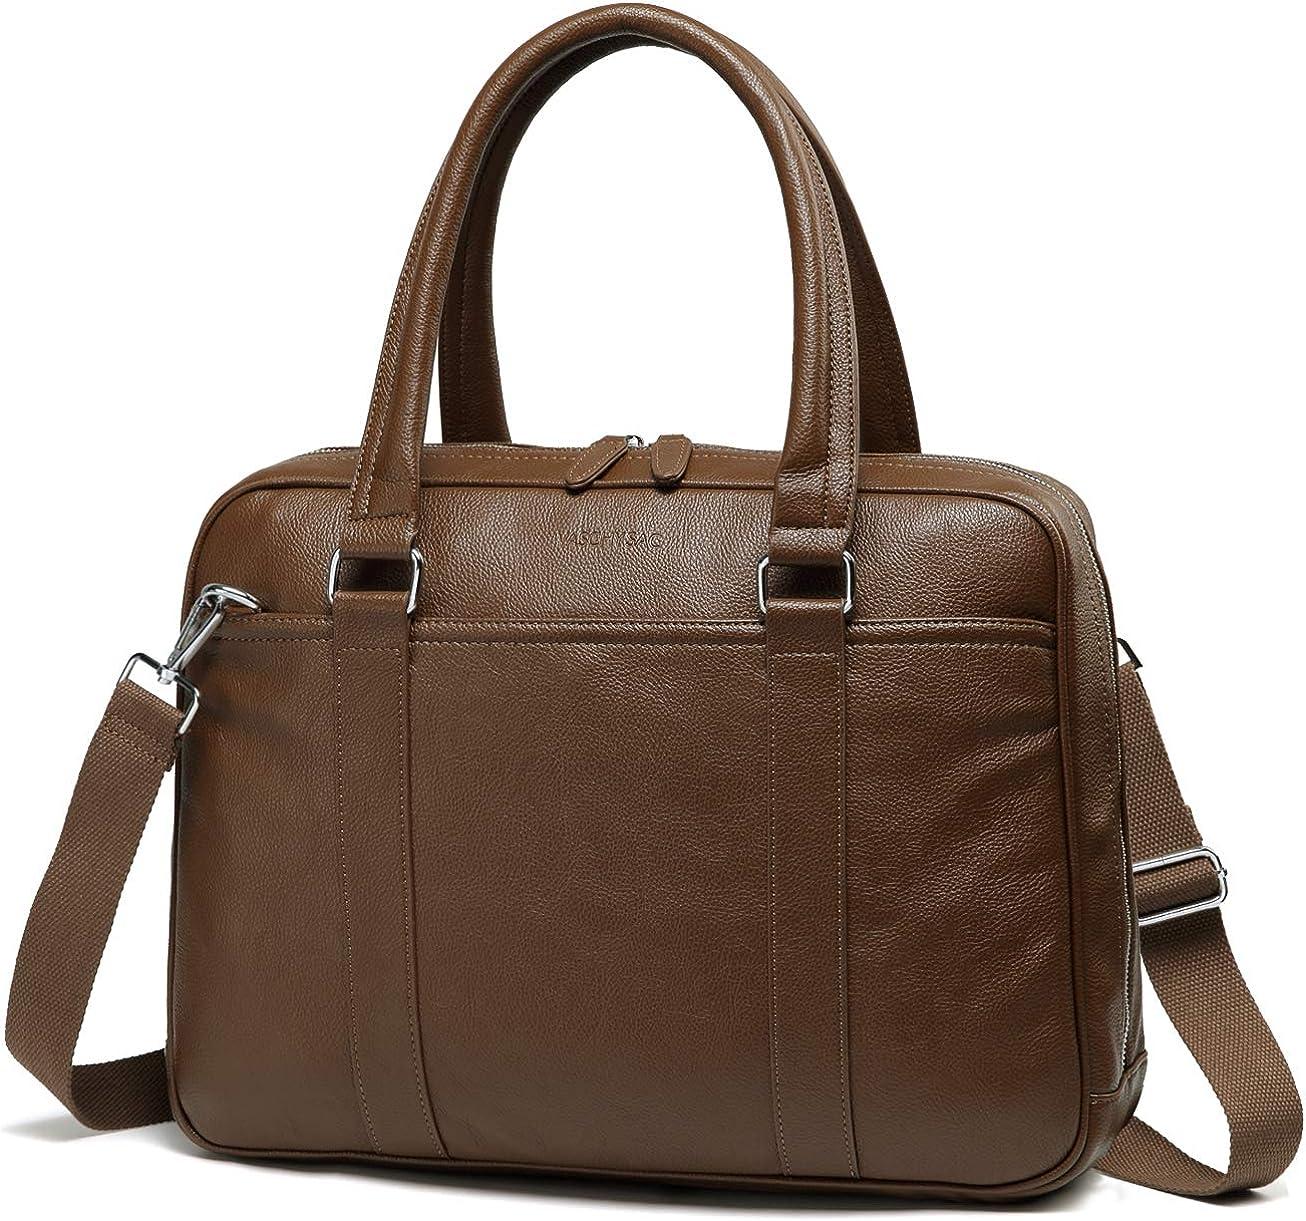 Laptop Bag for Women, VASCHY Slim Briefcase Business Messenger Bag 14 inch Laptop Handbag for Work